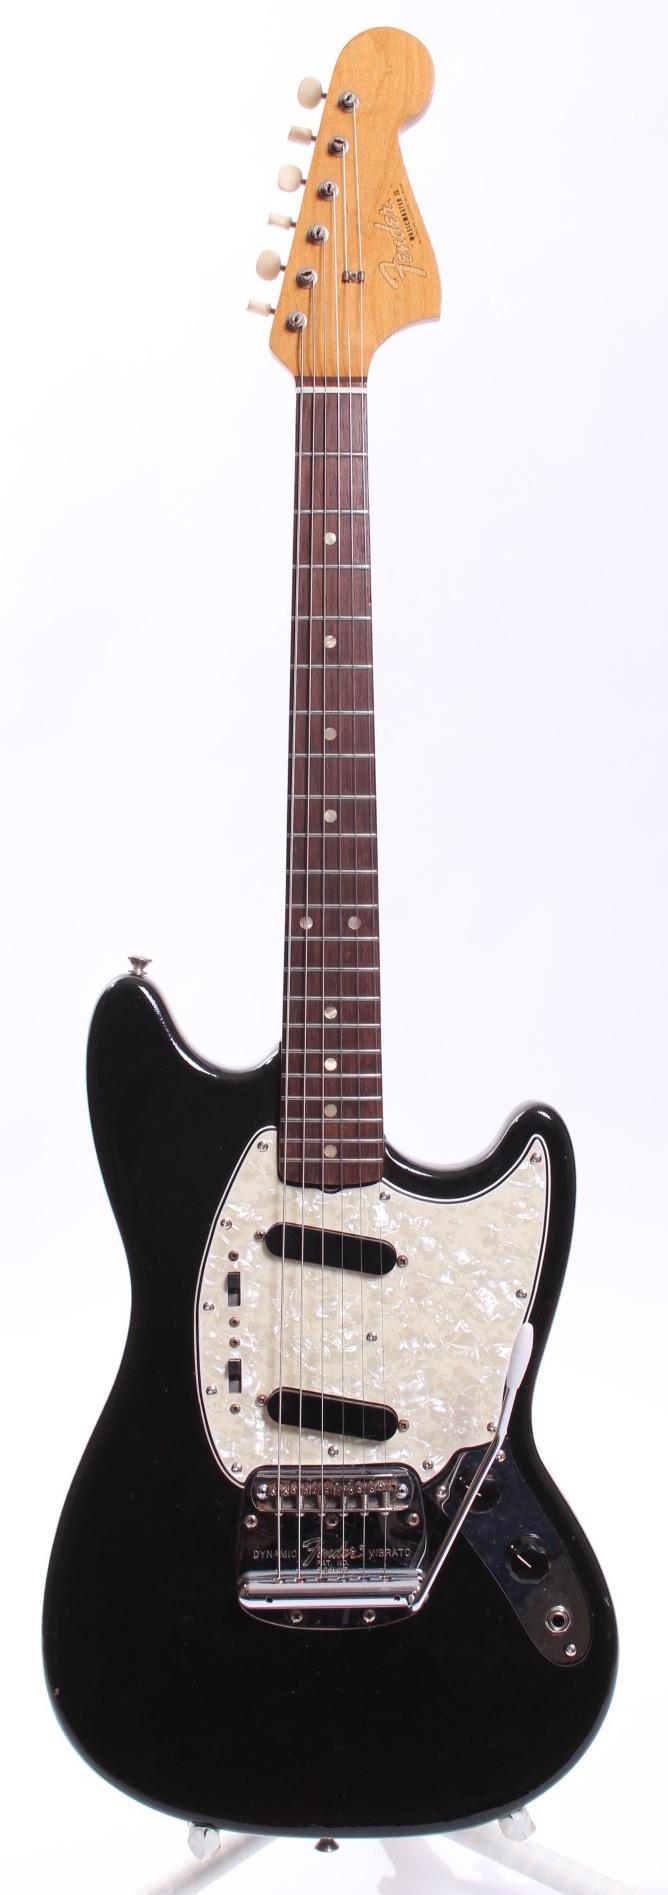 fender mustang musicmaster ii 1966 black guitar for sale yeahman 39 s guitars. Black Bedroom Furniture Sets. Home Design Ideas